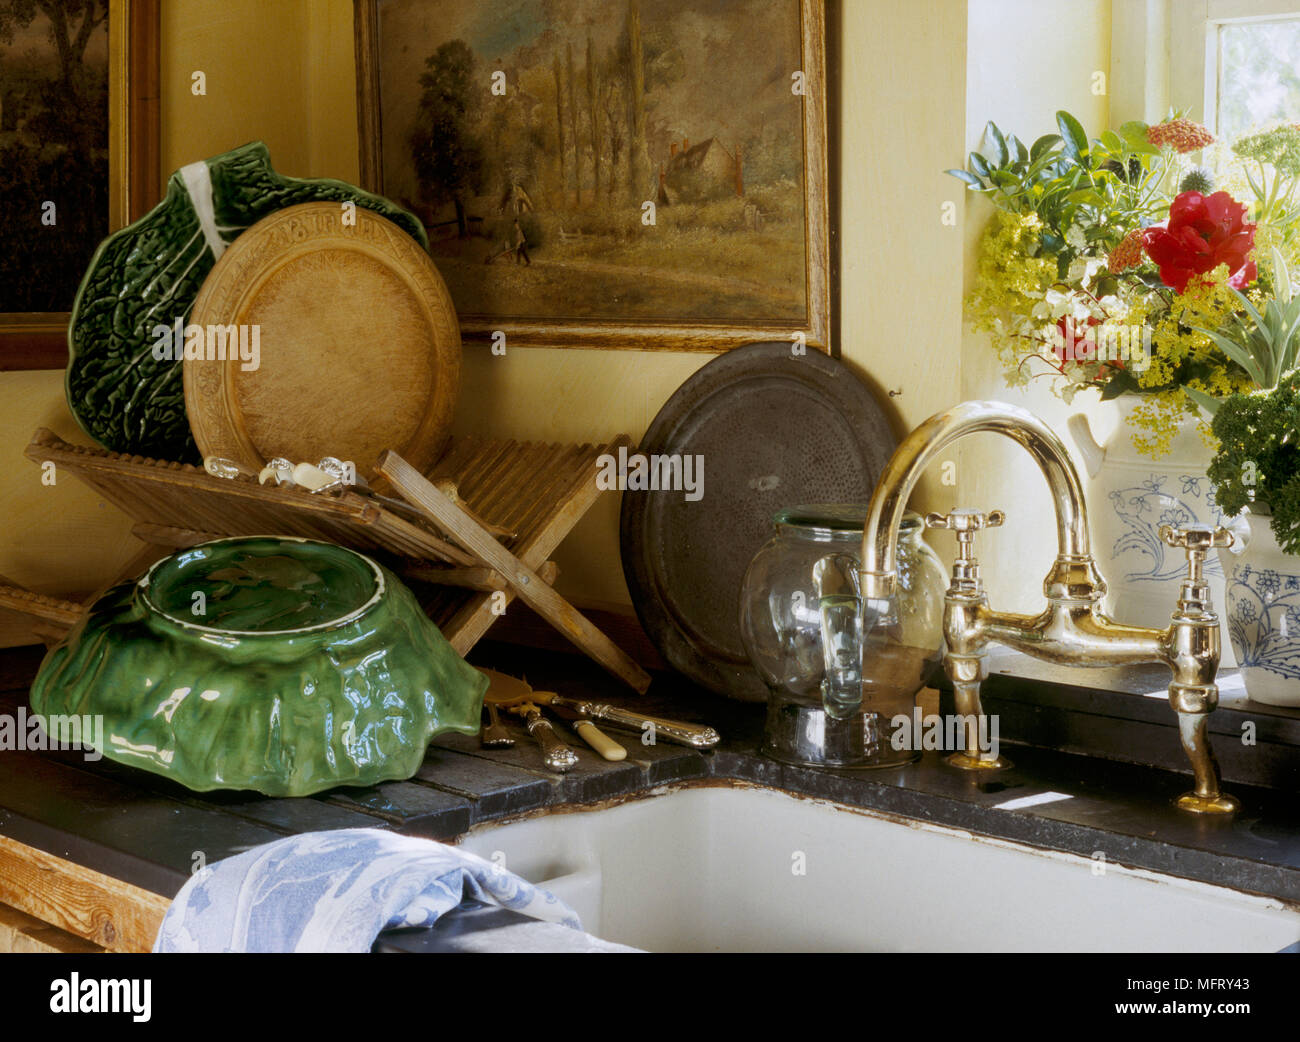 Belfast Sink Stockfotos & Belfast Sink Bilder - Alamy